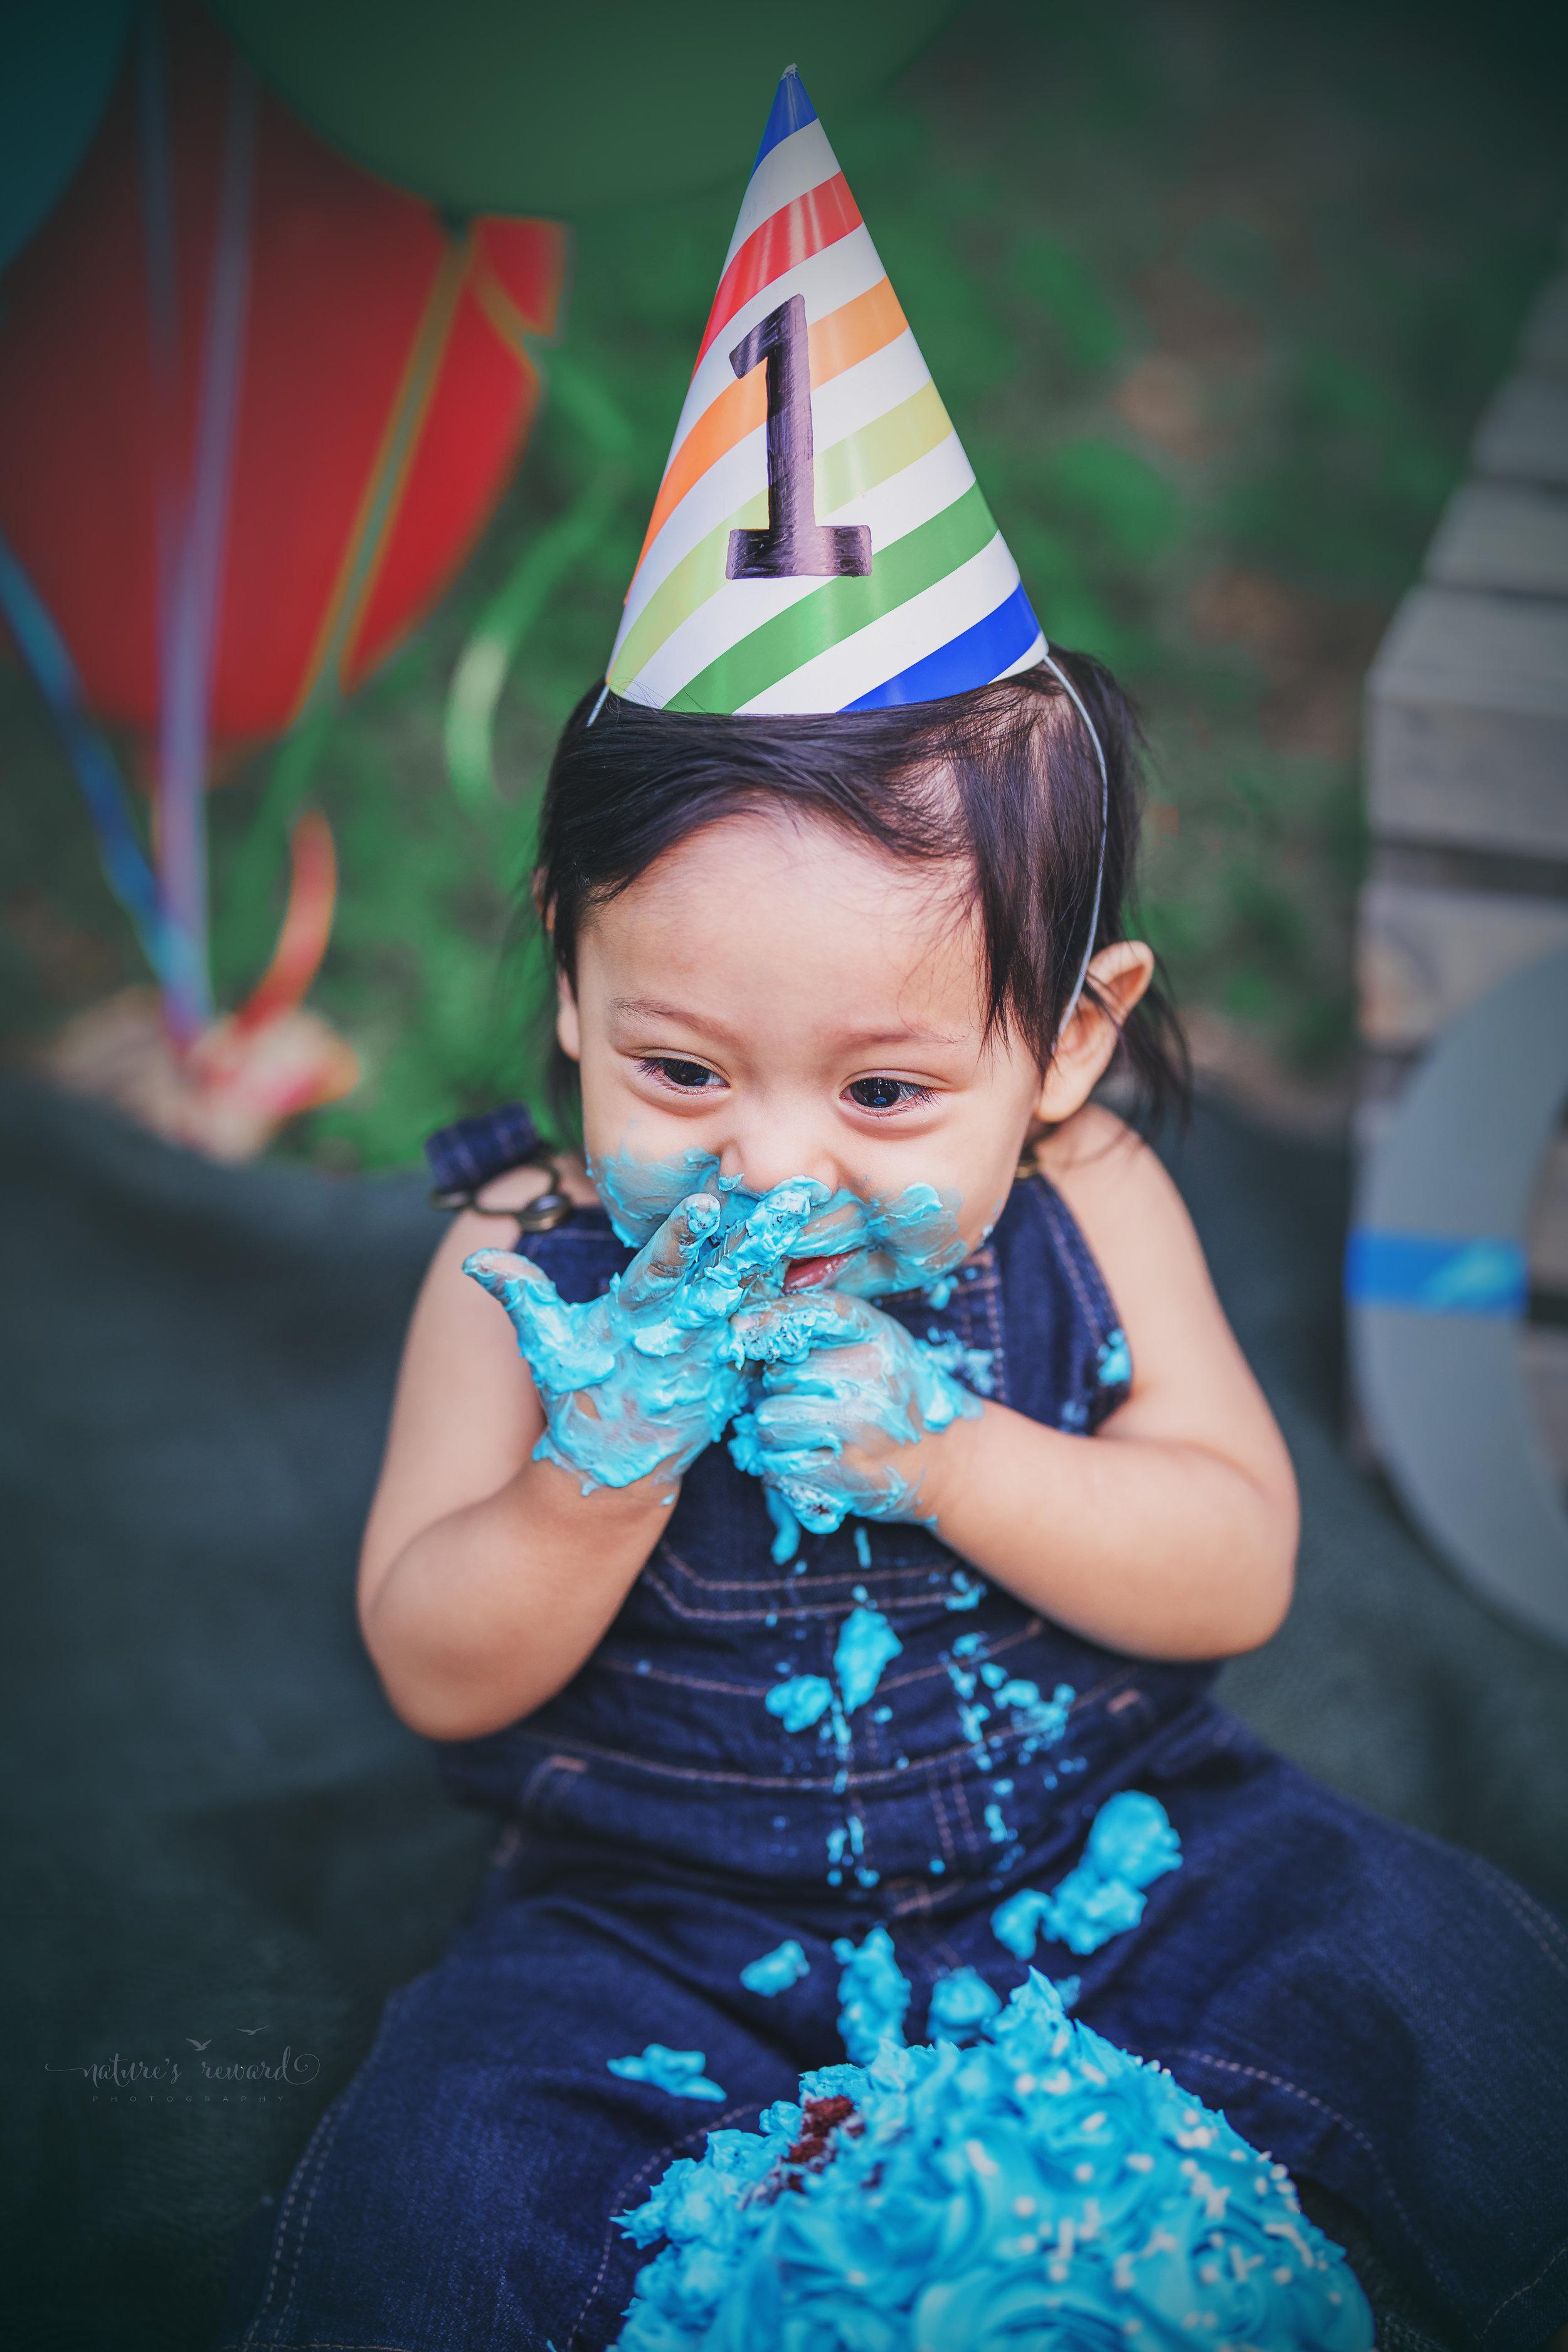 Cake smash portrait by Nature's Reward Photography